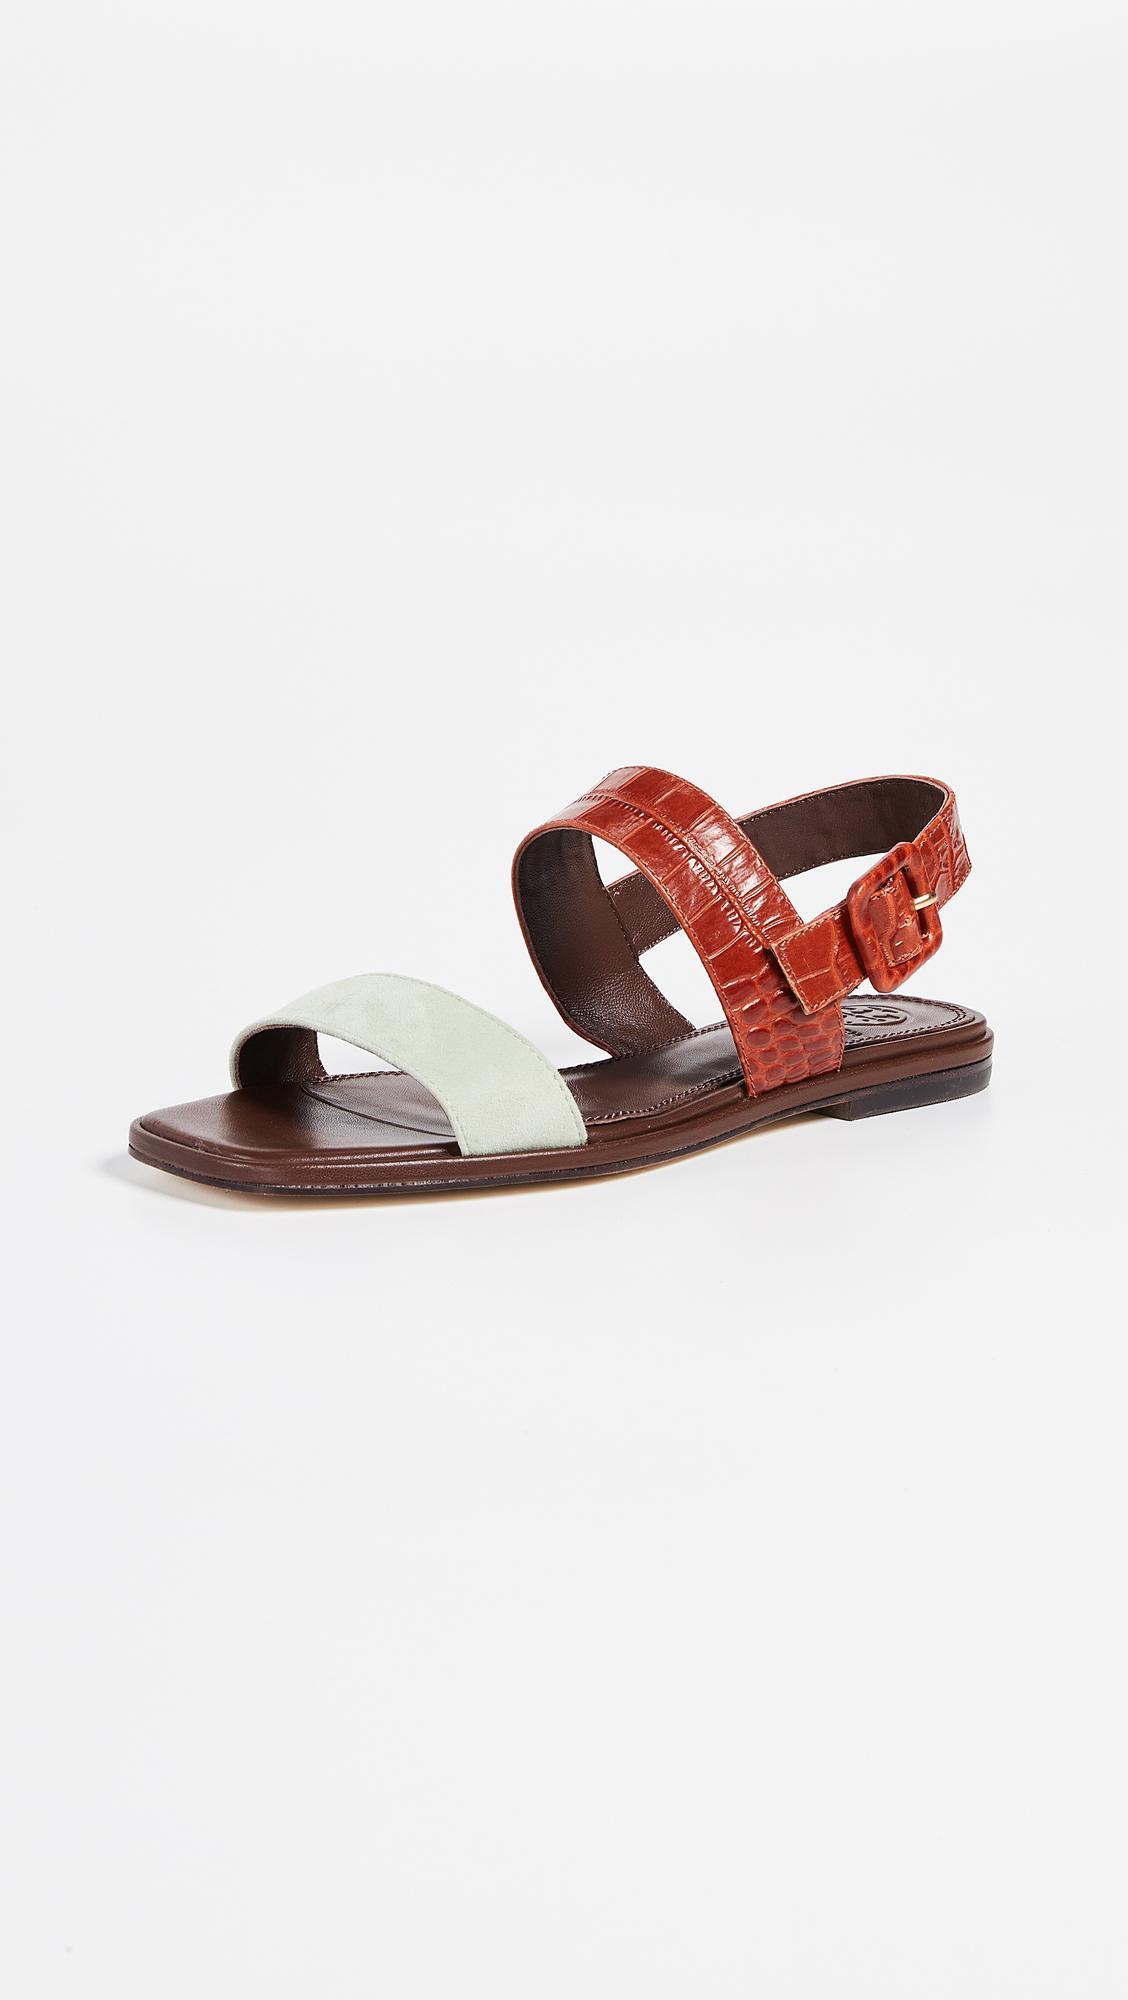 d6ecb5856e40 Tory Burch. Women s Delaney Flat Sandals